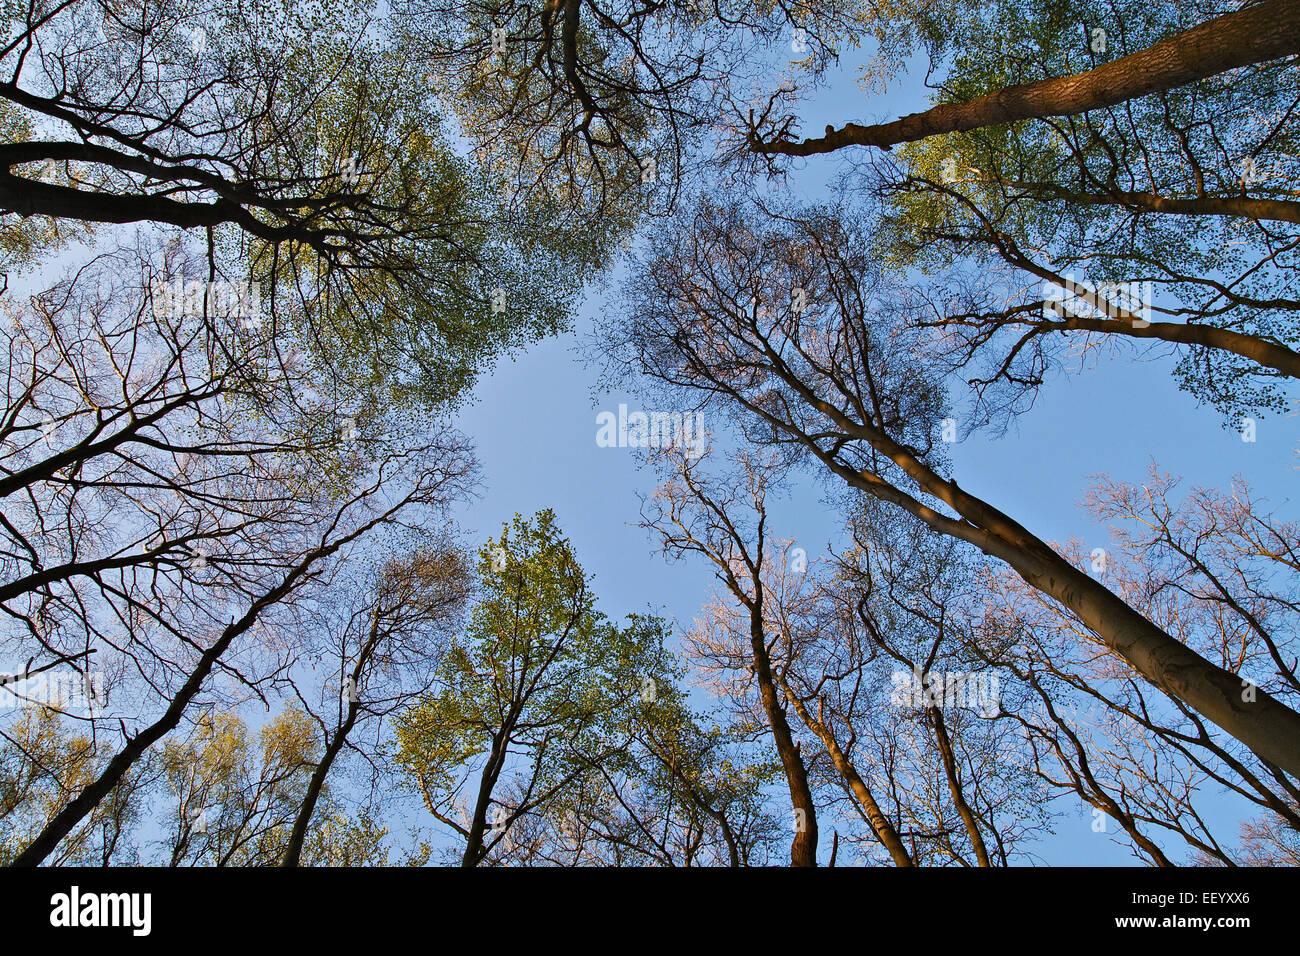 Baumkronen im Wald. Stockbild